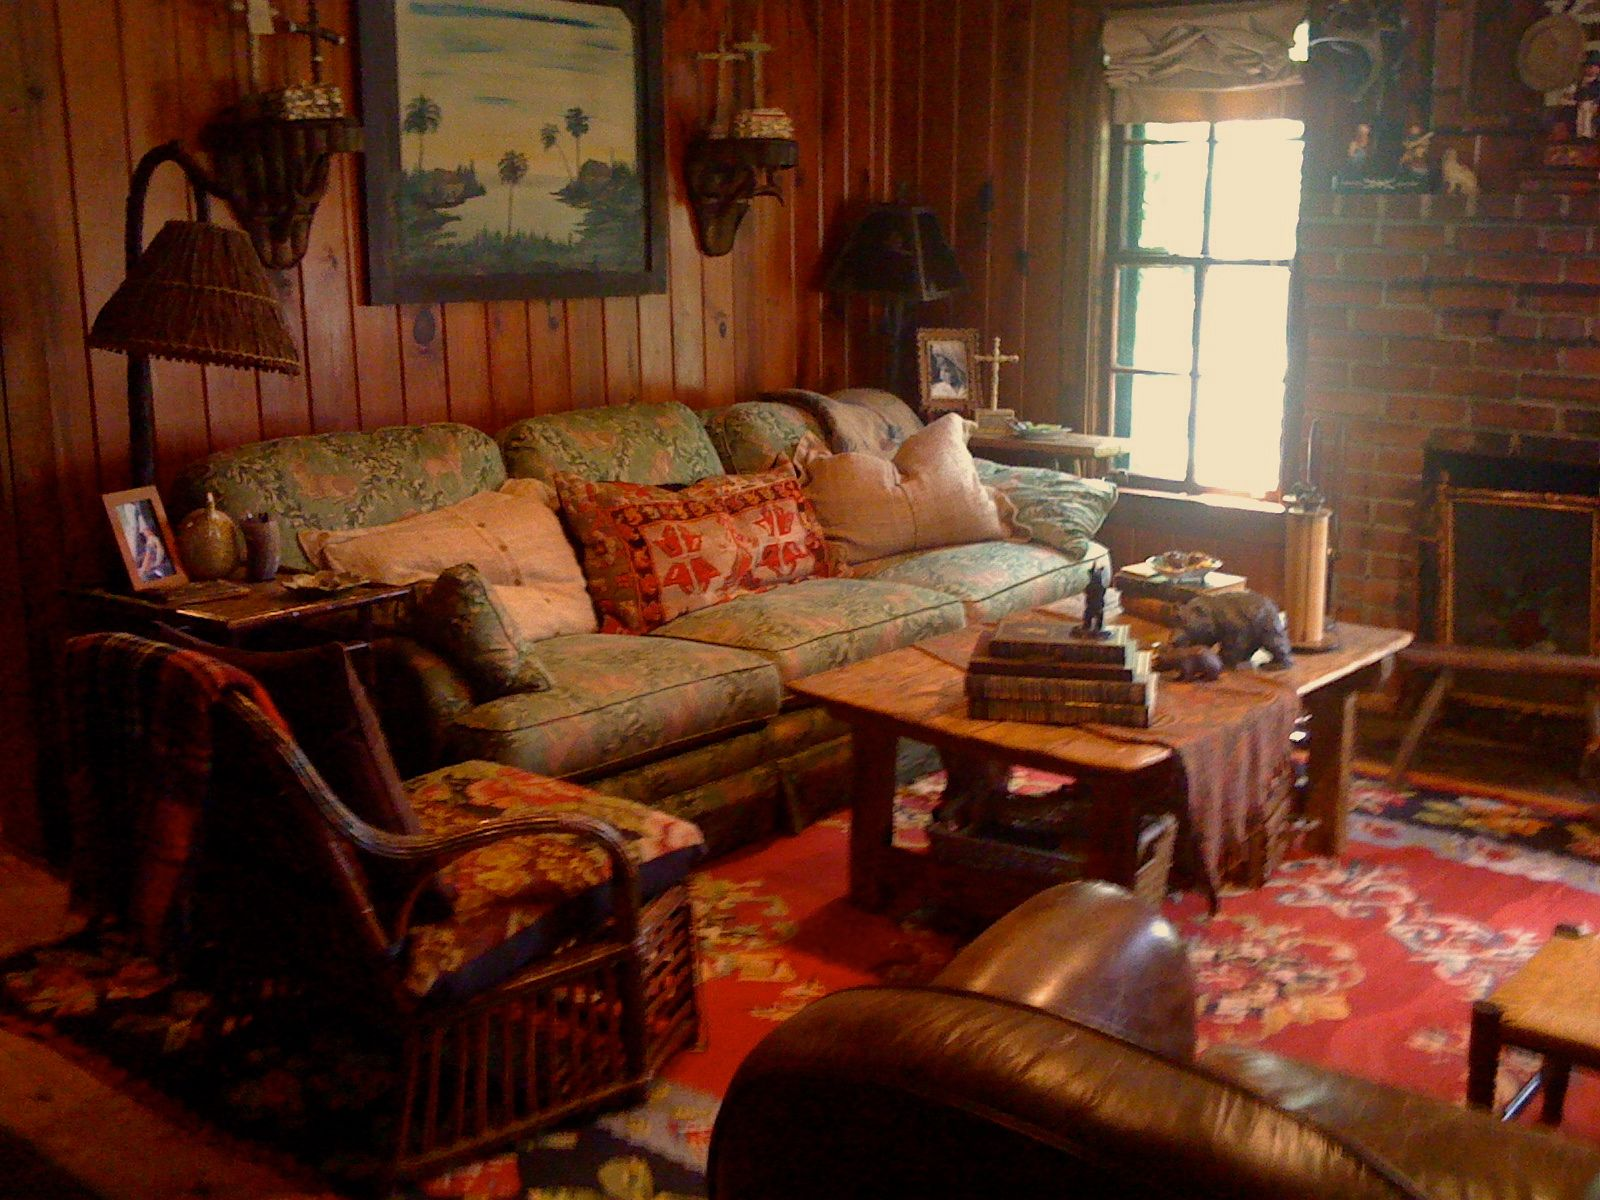 Farmhouse Living Room Decorating ideas Pinterest